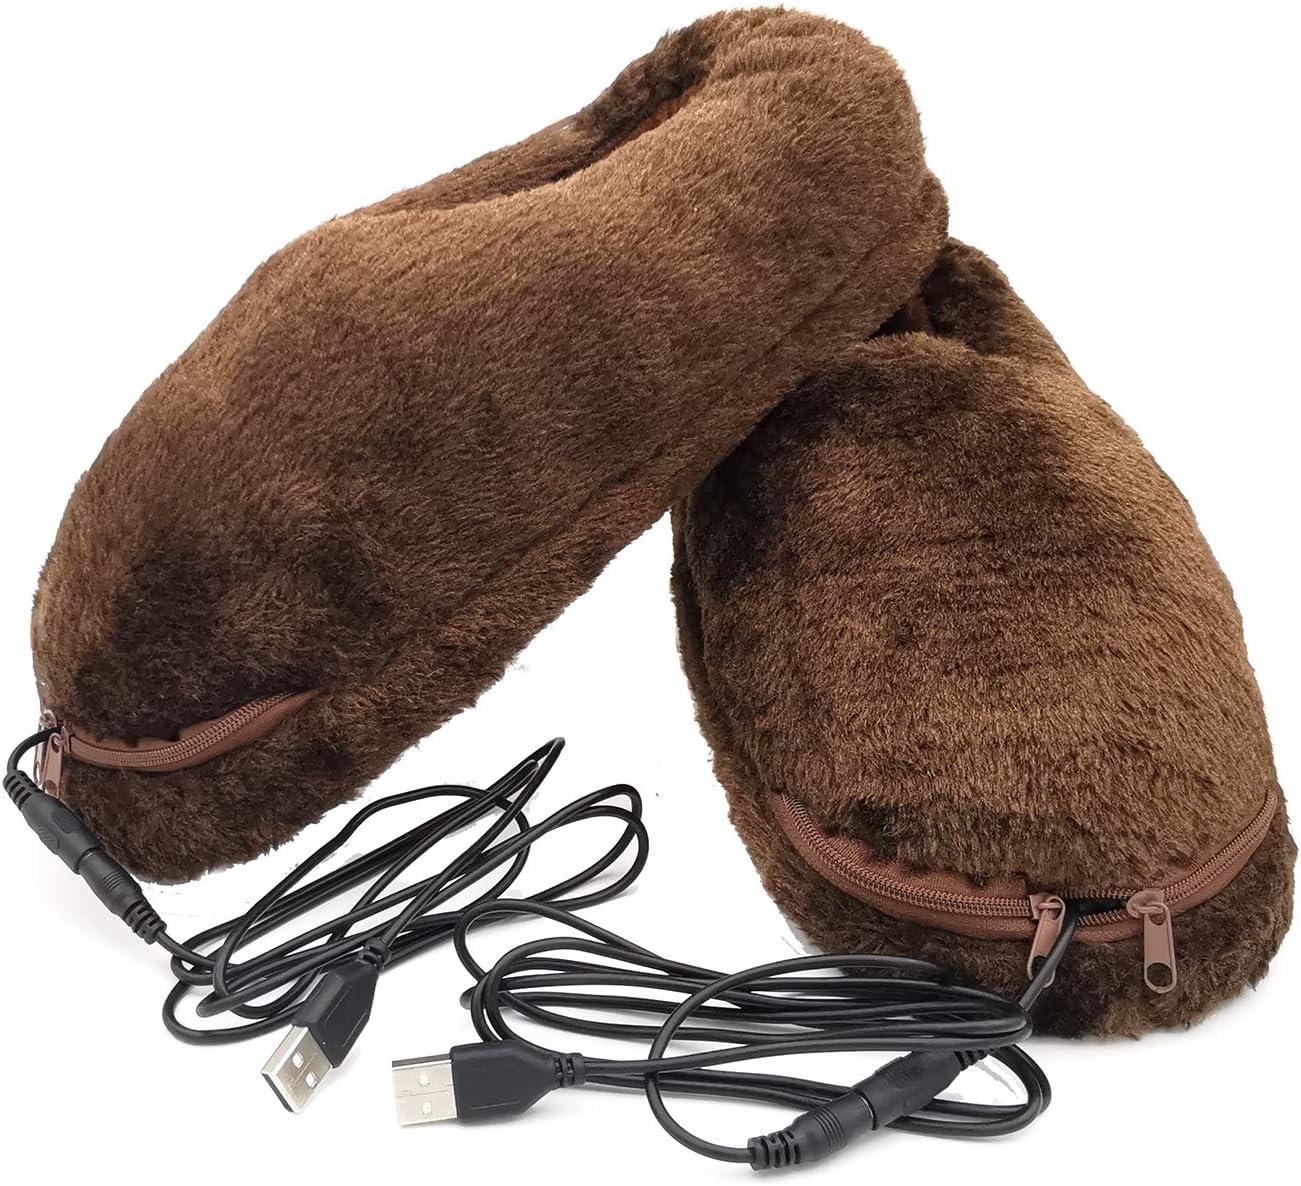 USB Heated Slipper Heated Foot Warmers Heating Pad Insole (Coffee)